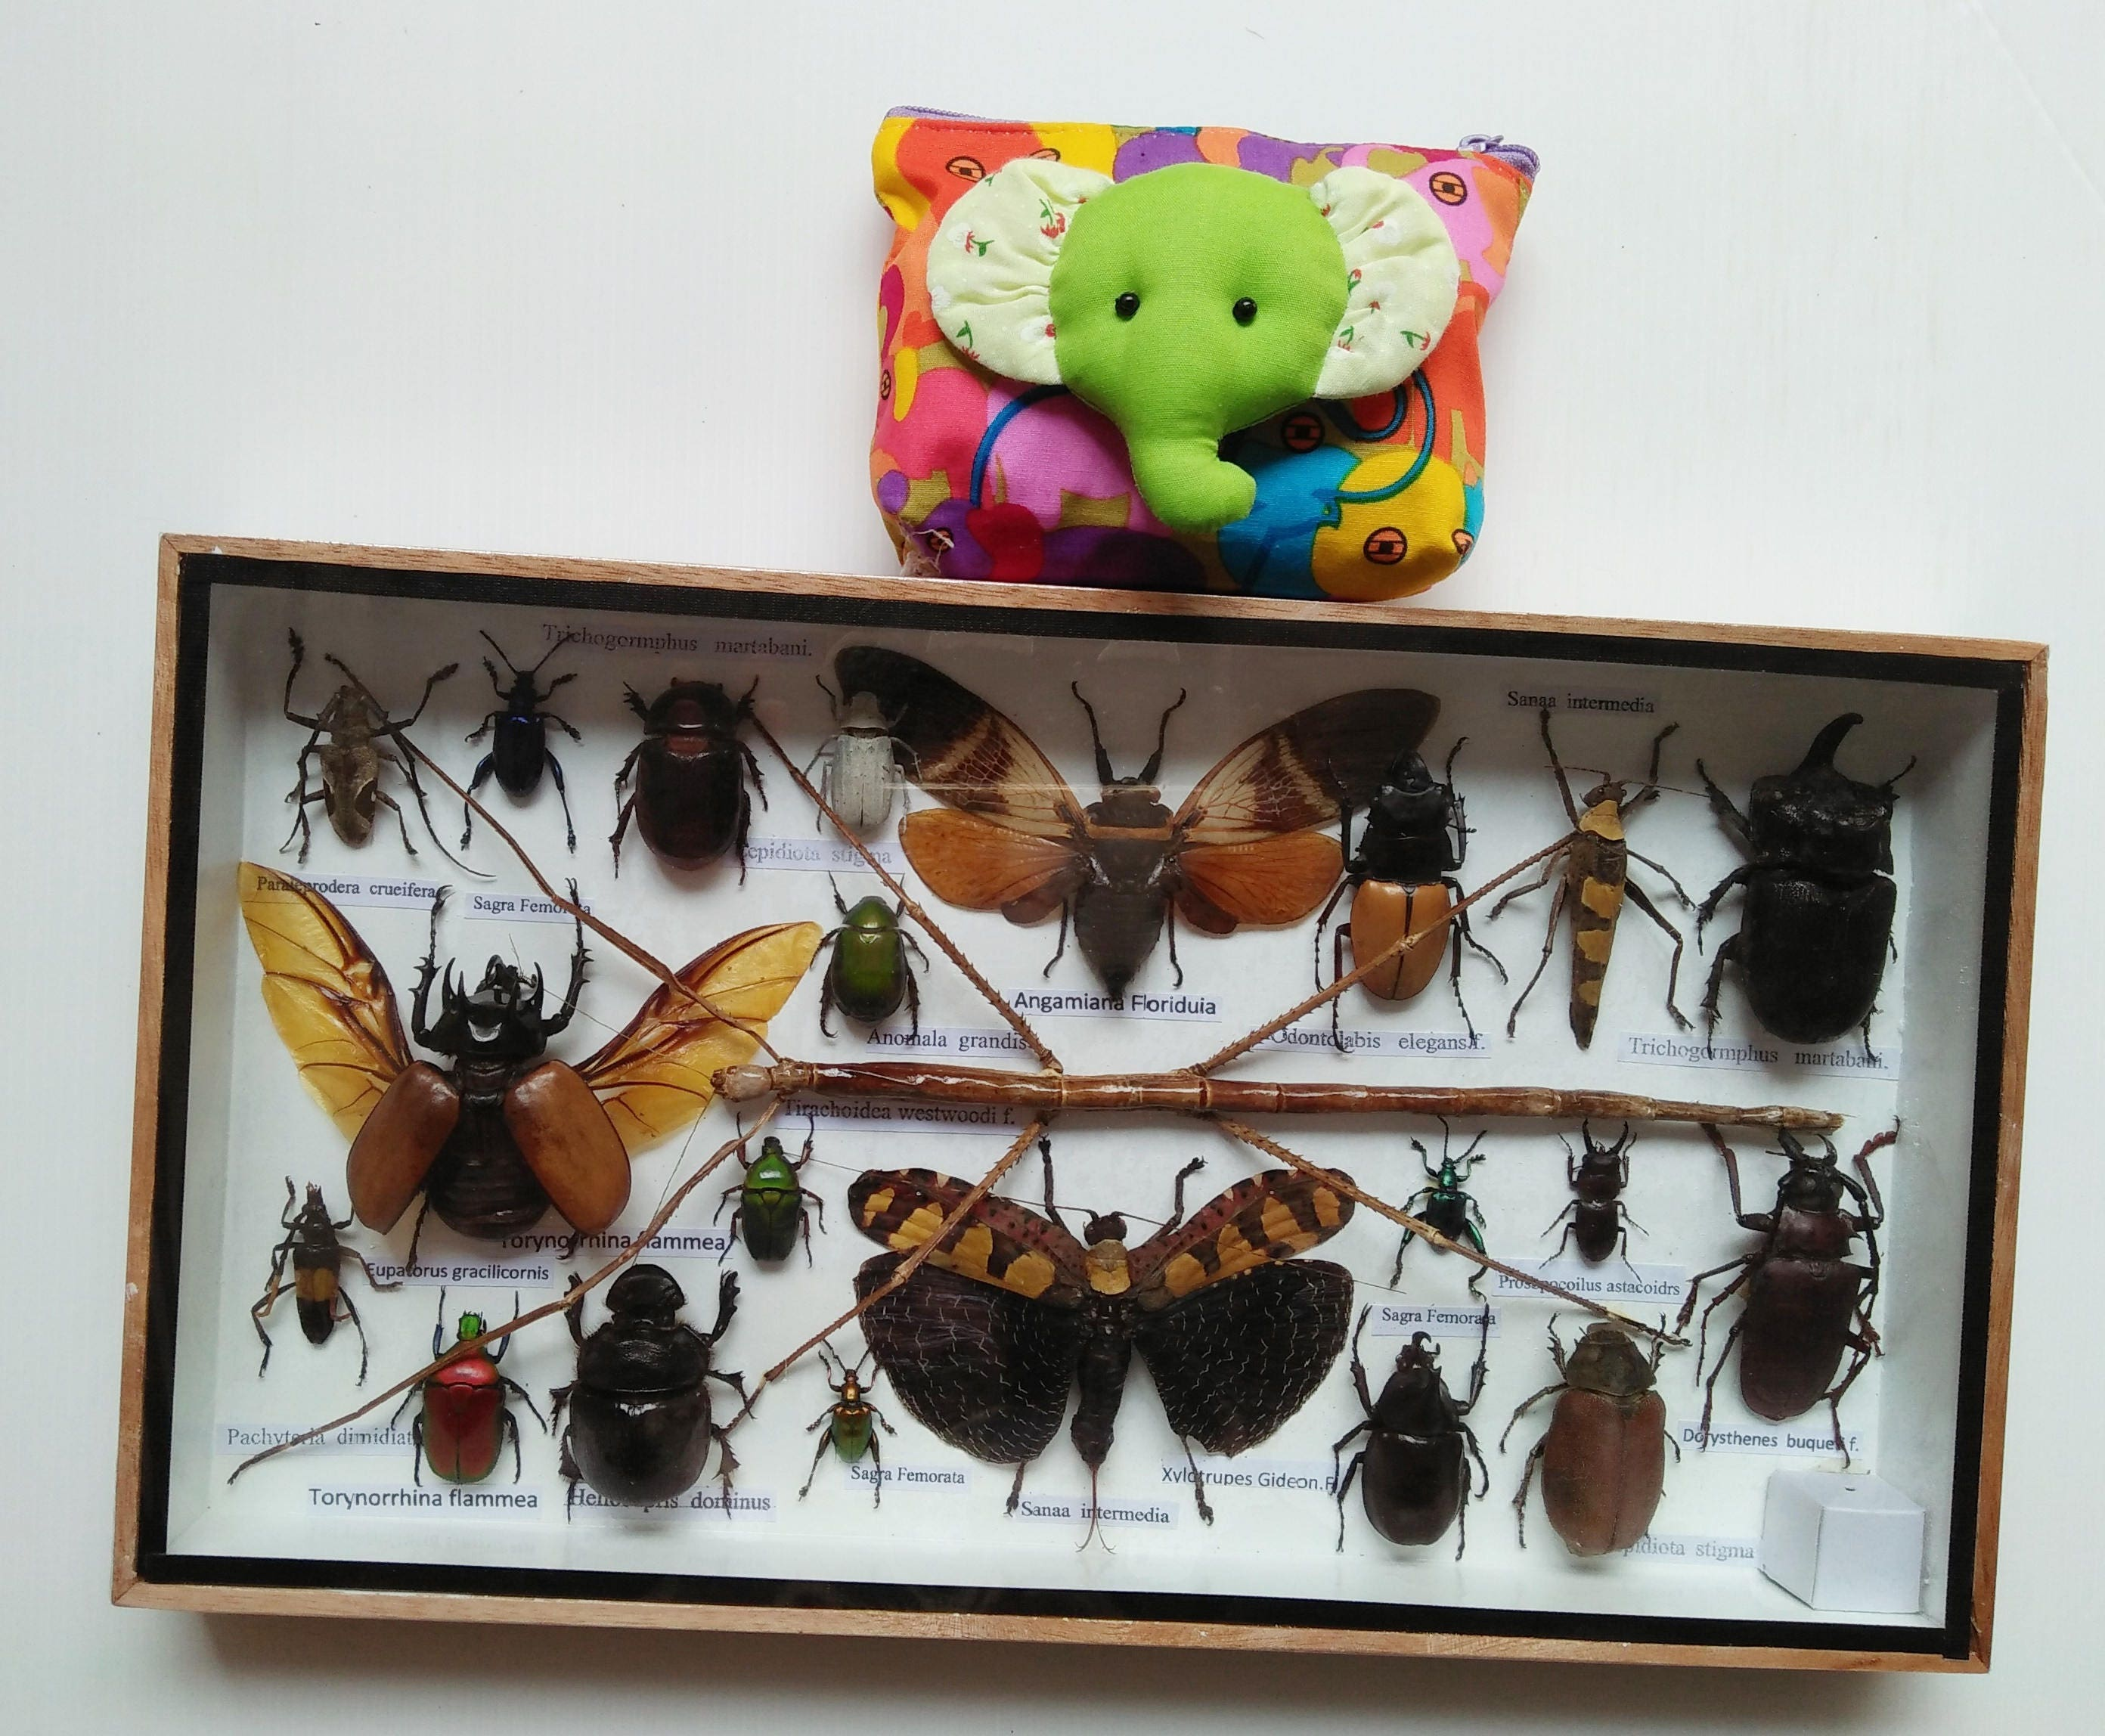 3D echte große Insekt Insekten Bugs Box gerahmt Rahmen Display